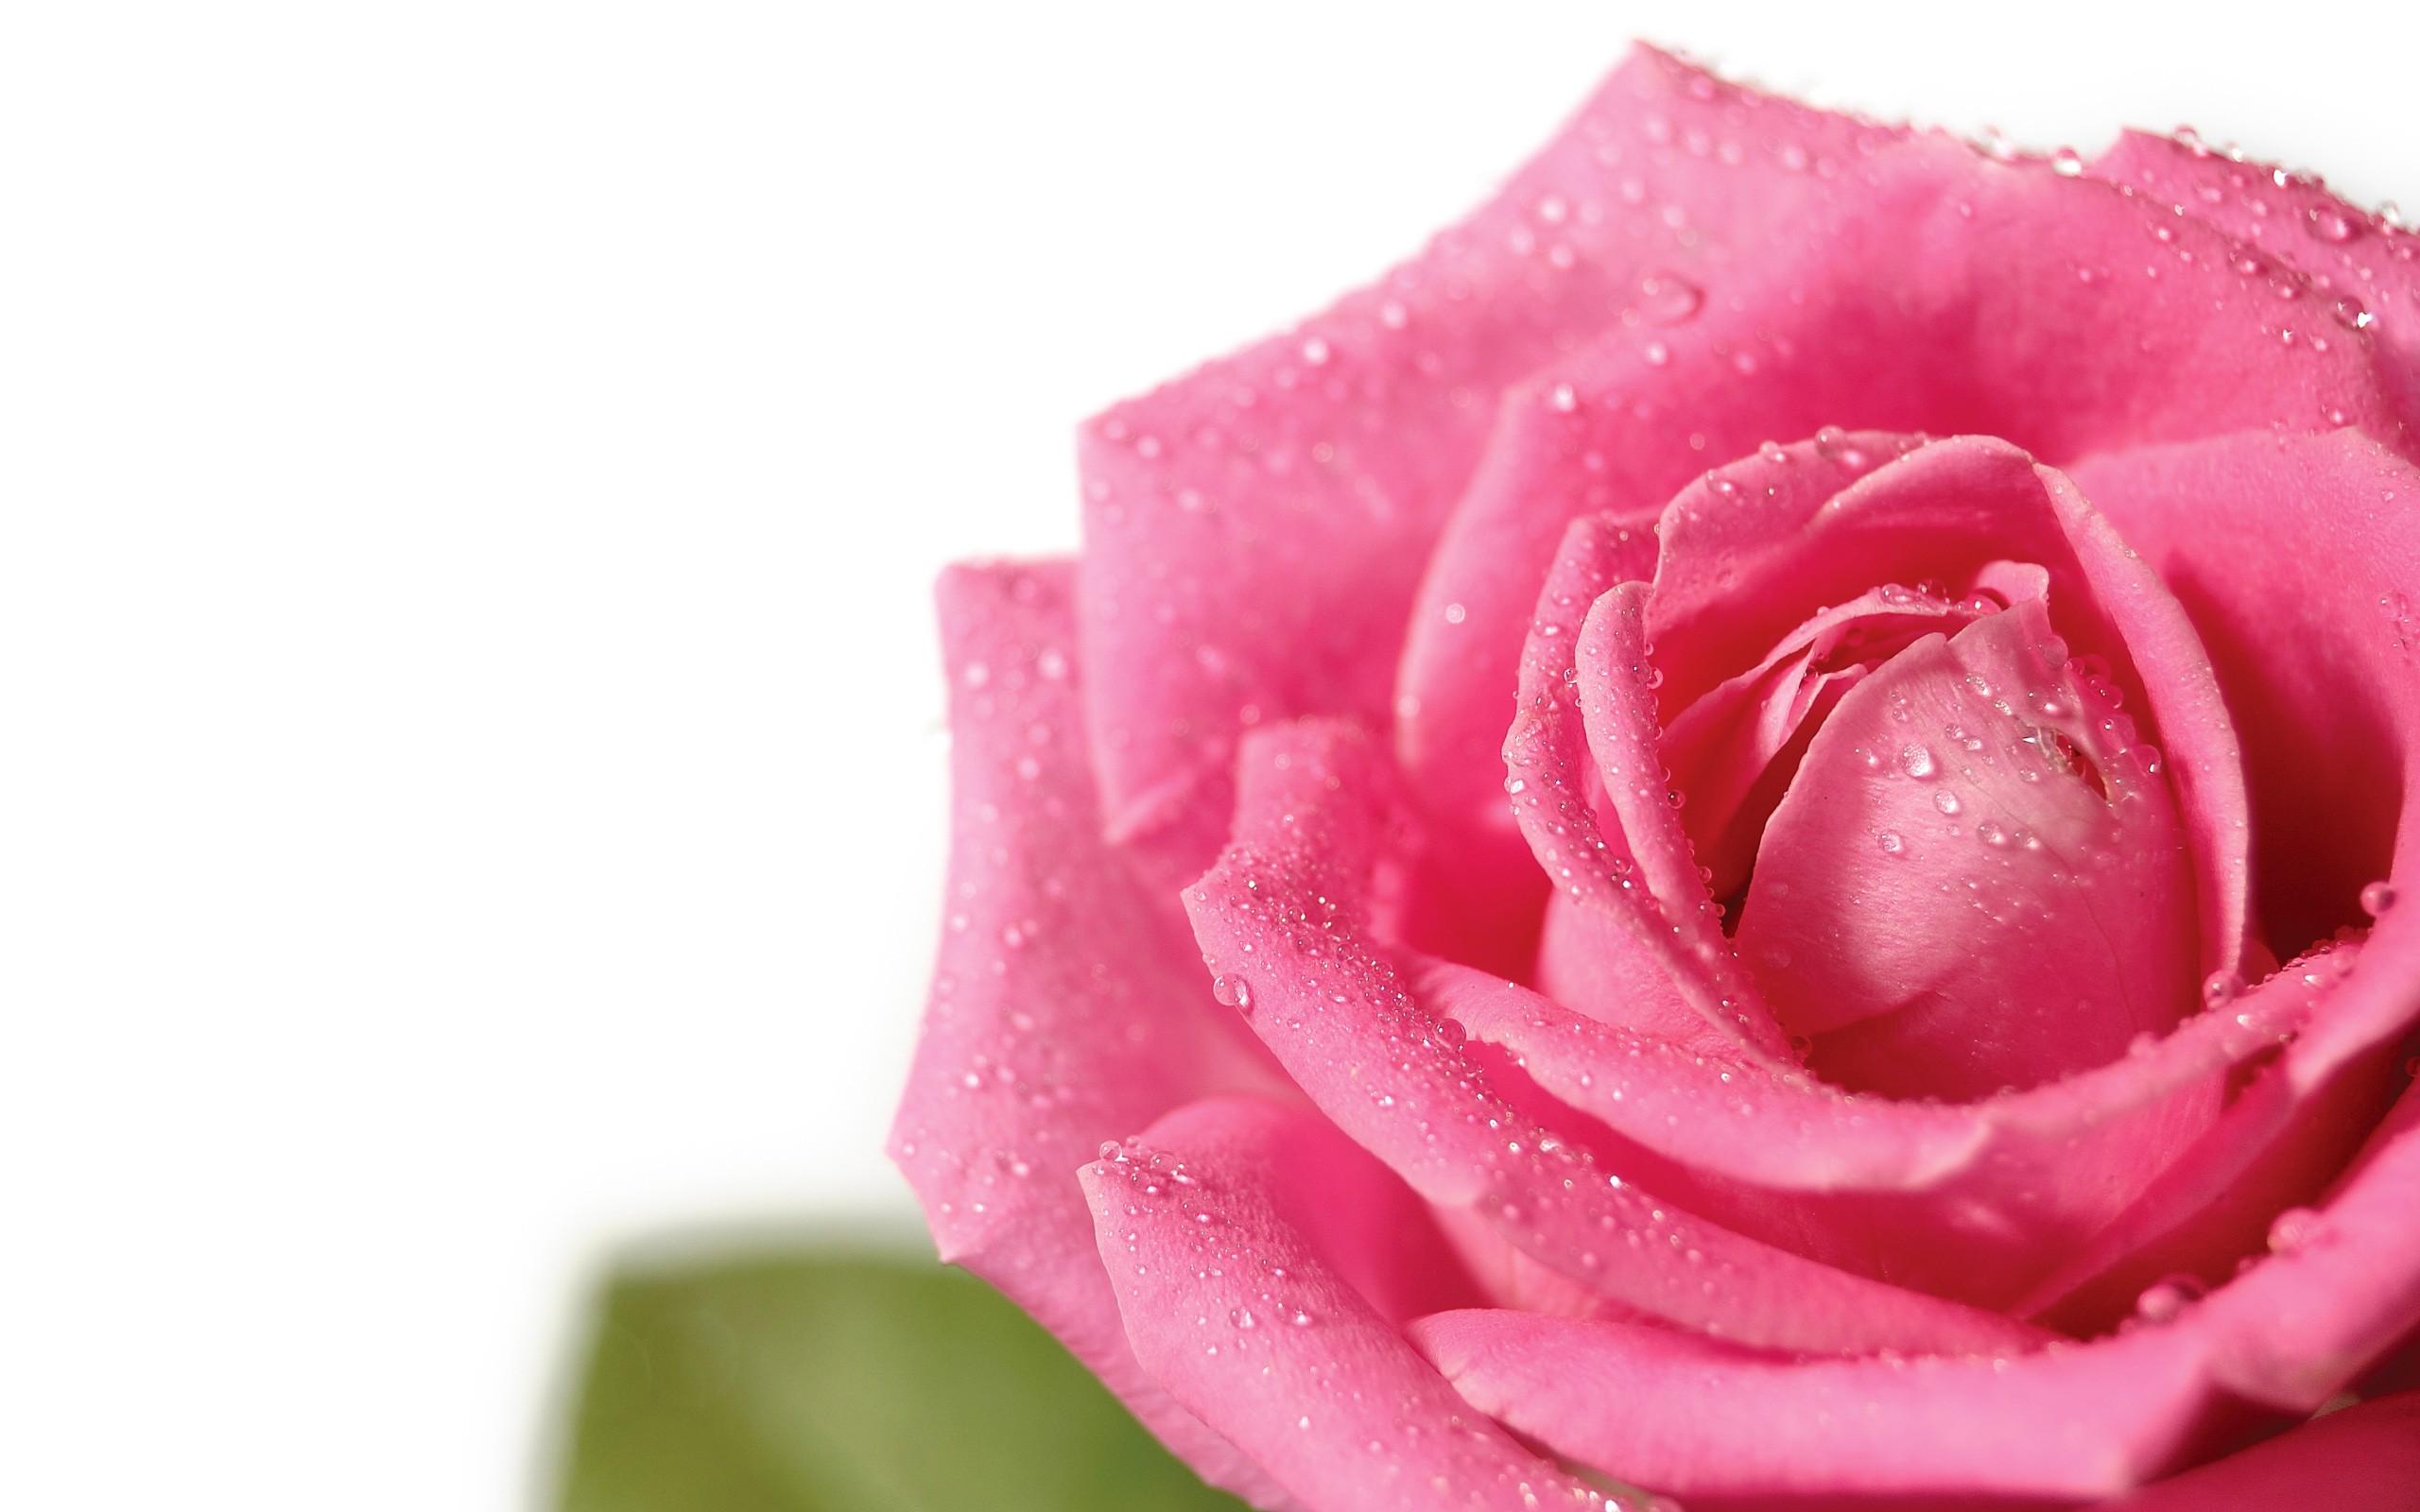 Fondos Flores ADNFriki (8)